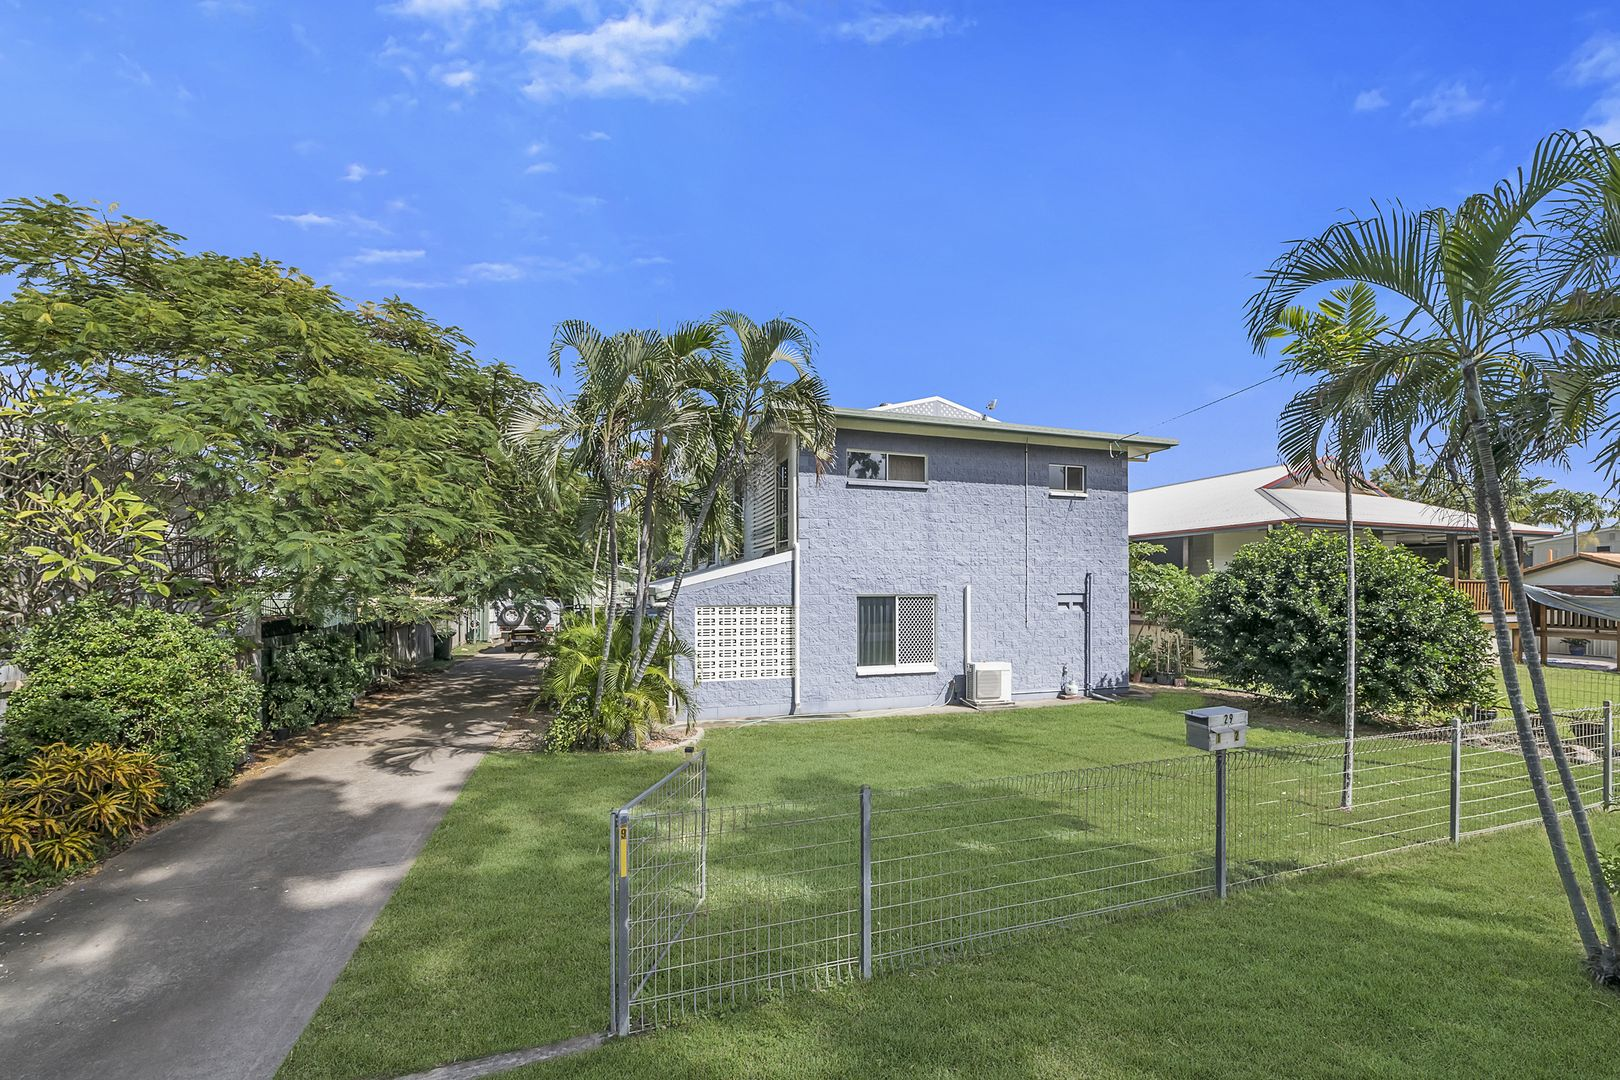 29 Reef Street, Saunders Beach QLD 4818, Image 0